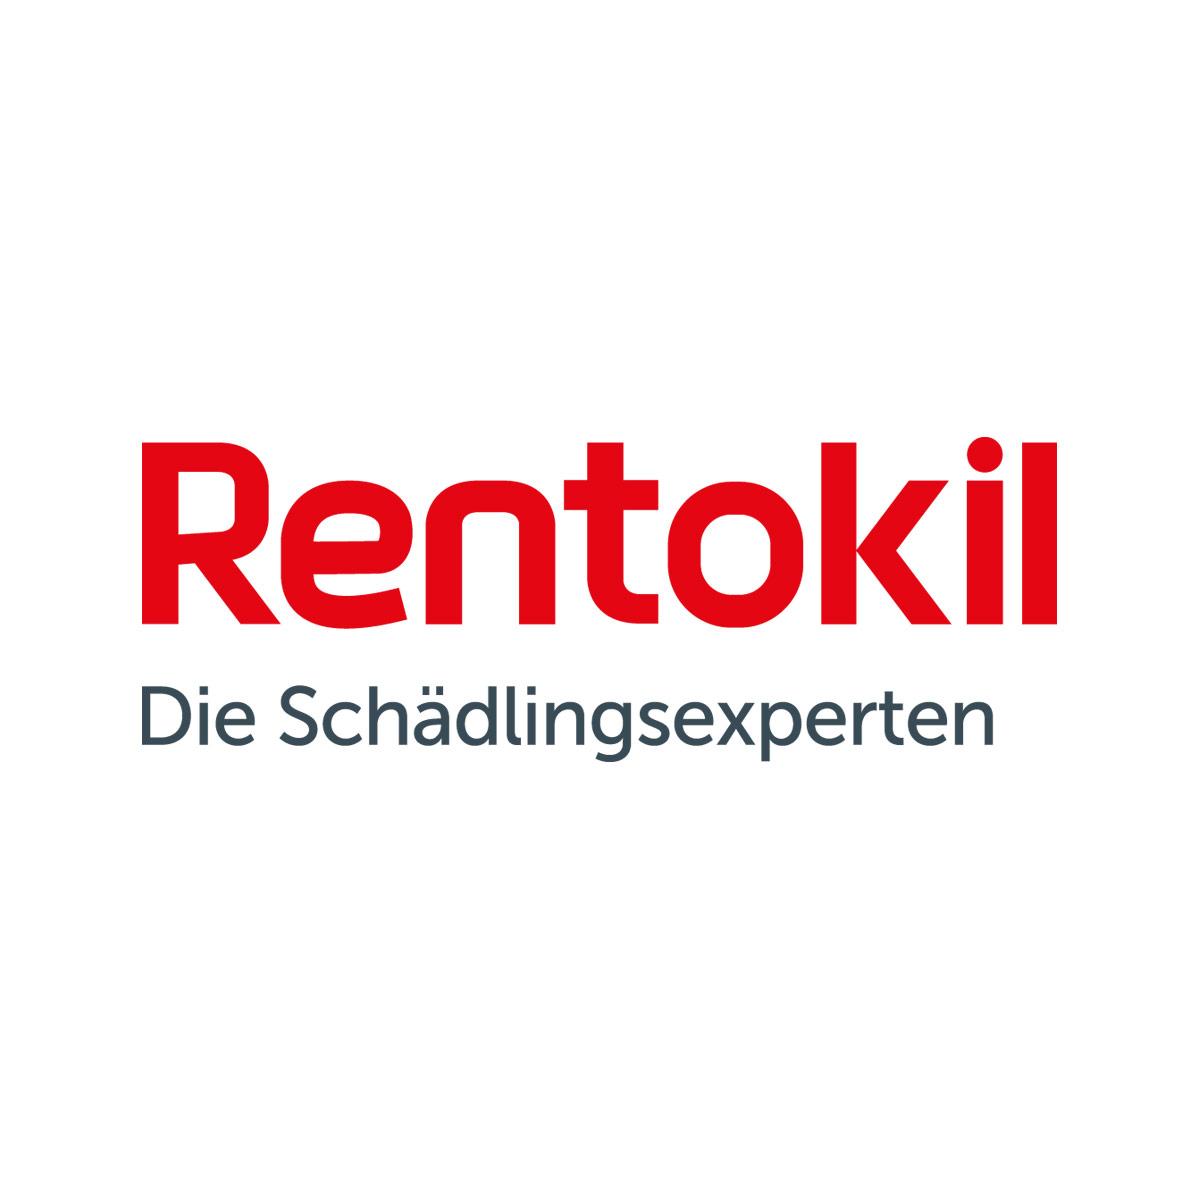 Rentokil Schädlingsbekämpfung Berlin